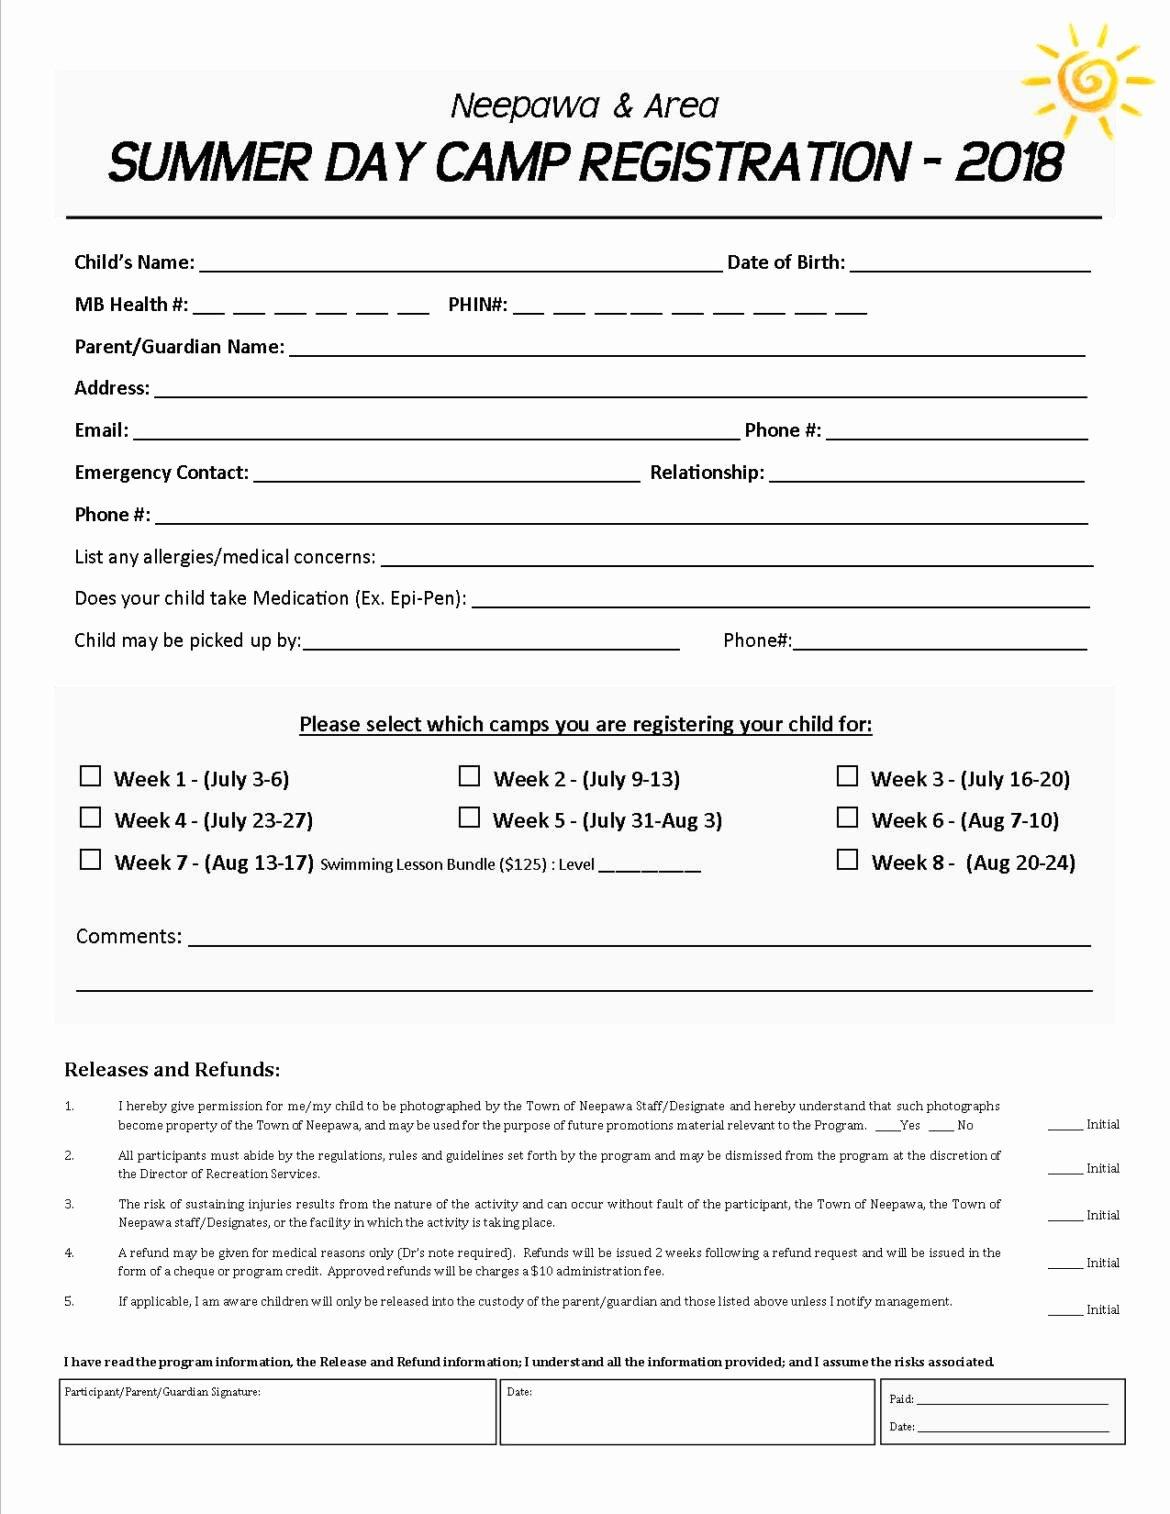 Camp Registration form Template Unique Day Camp Registration form 2018 town Of Neepawa